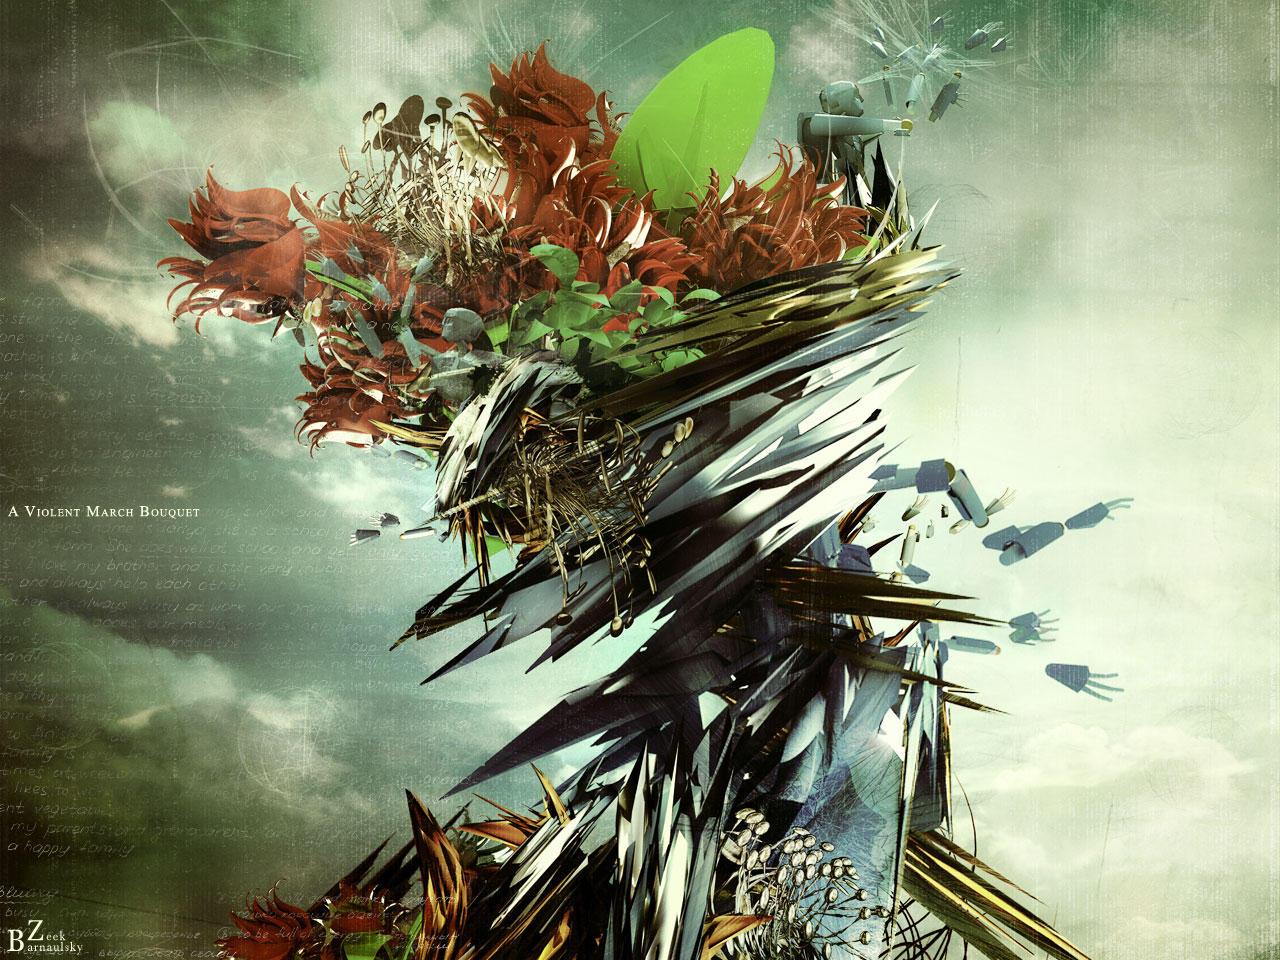 A violent march bouquet by barnaulsky-zeek